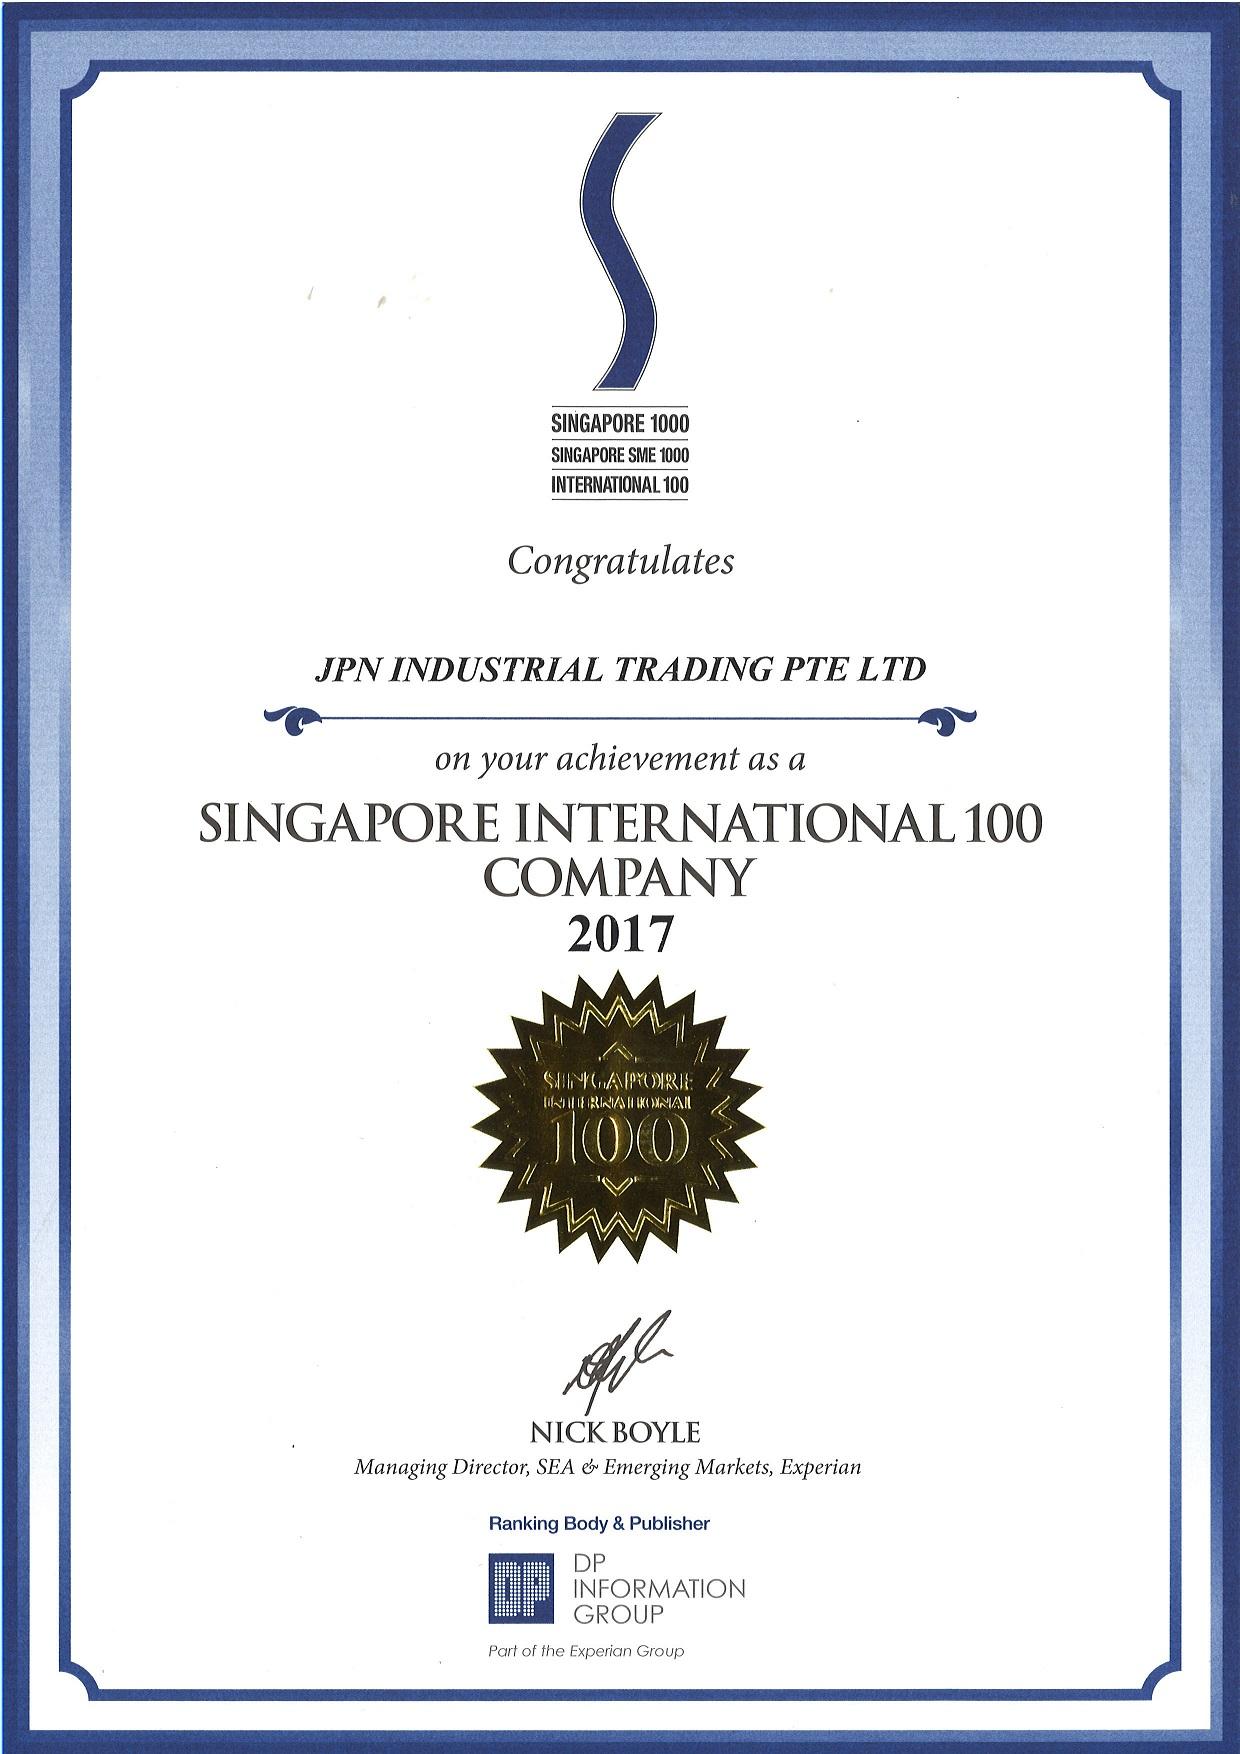 2017-SPORE-INTL-100